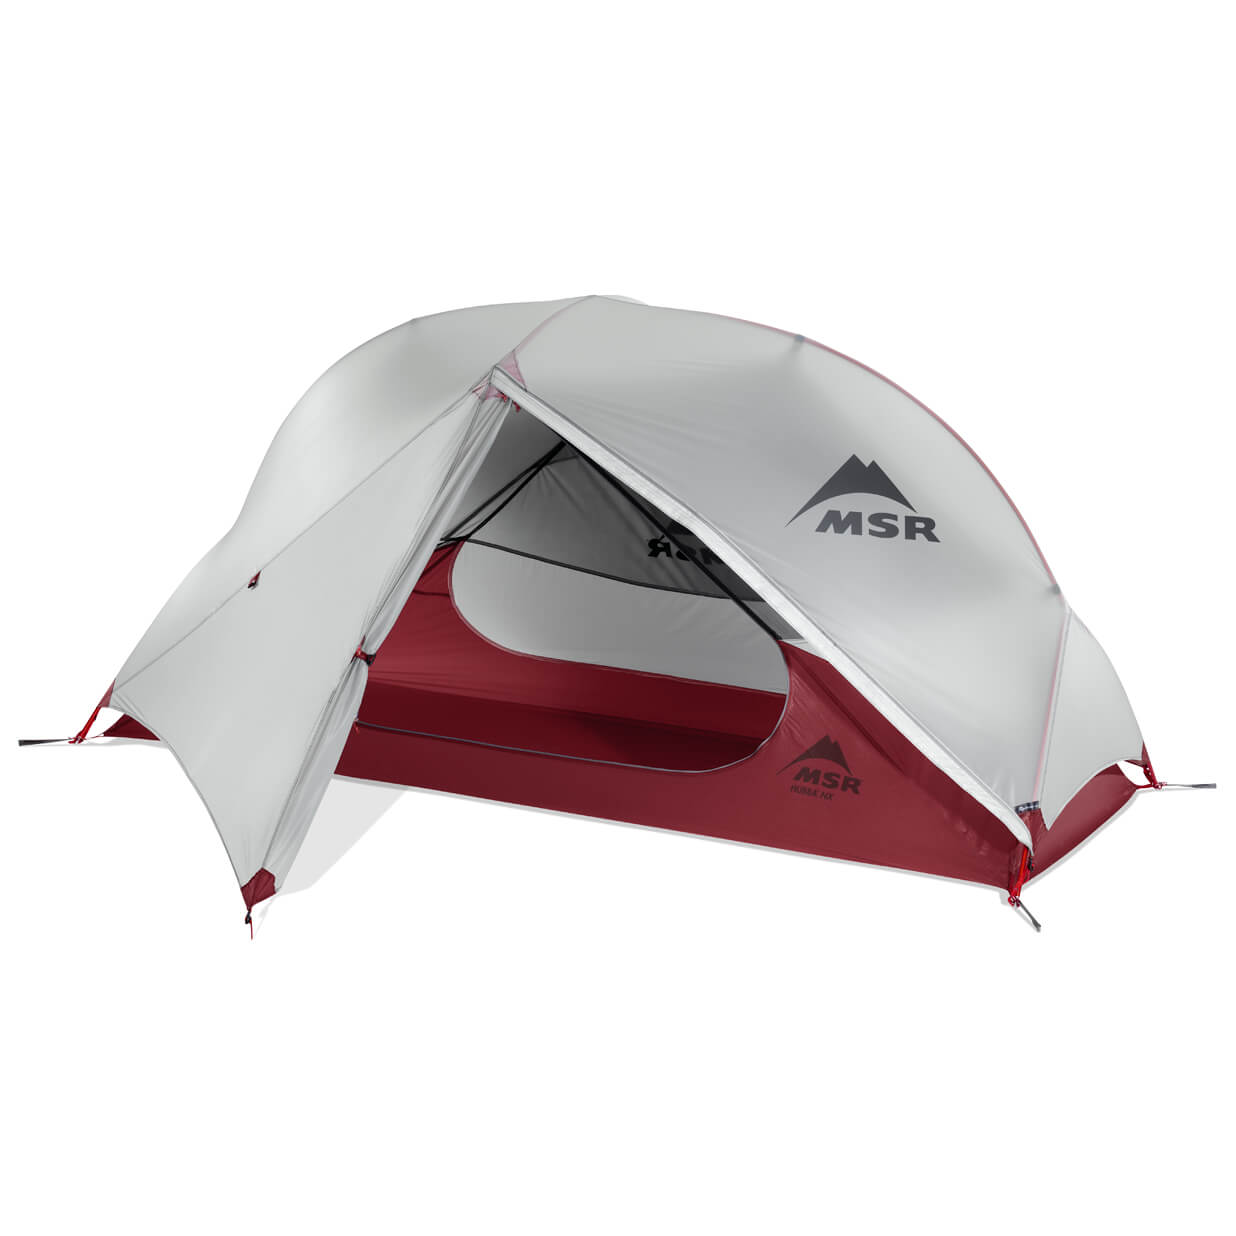 MSR Hubba NX 1 personers telt | Gratis forsendelse